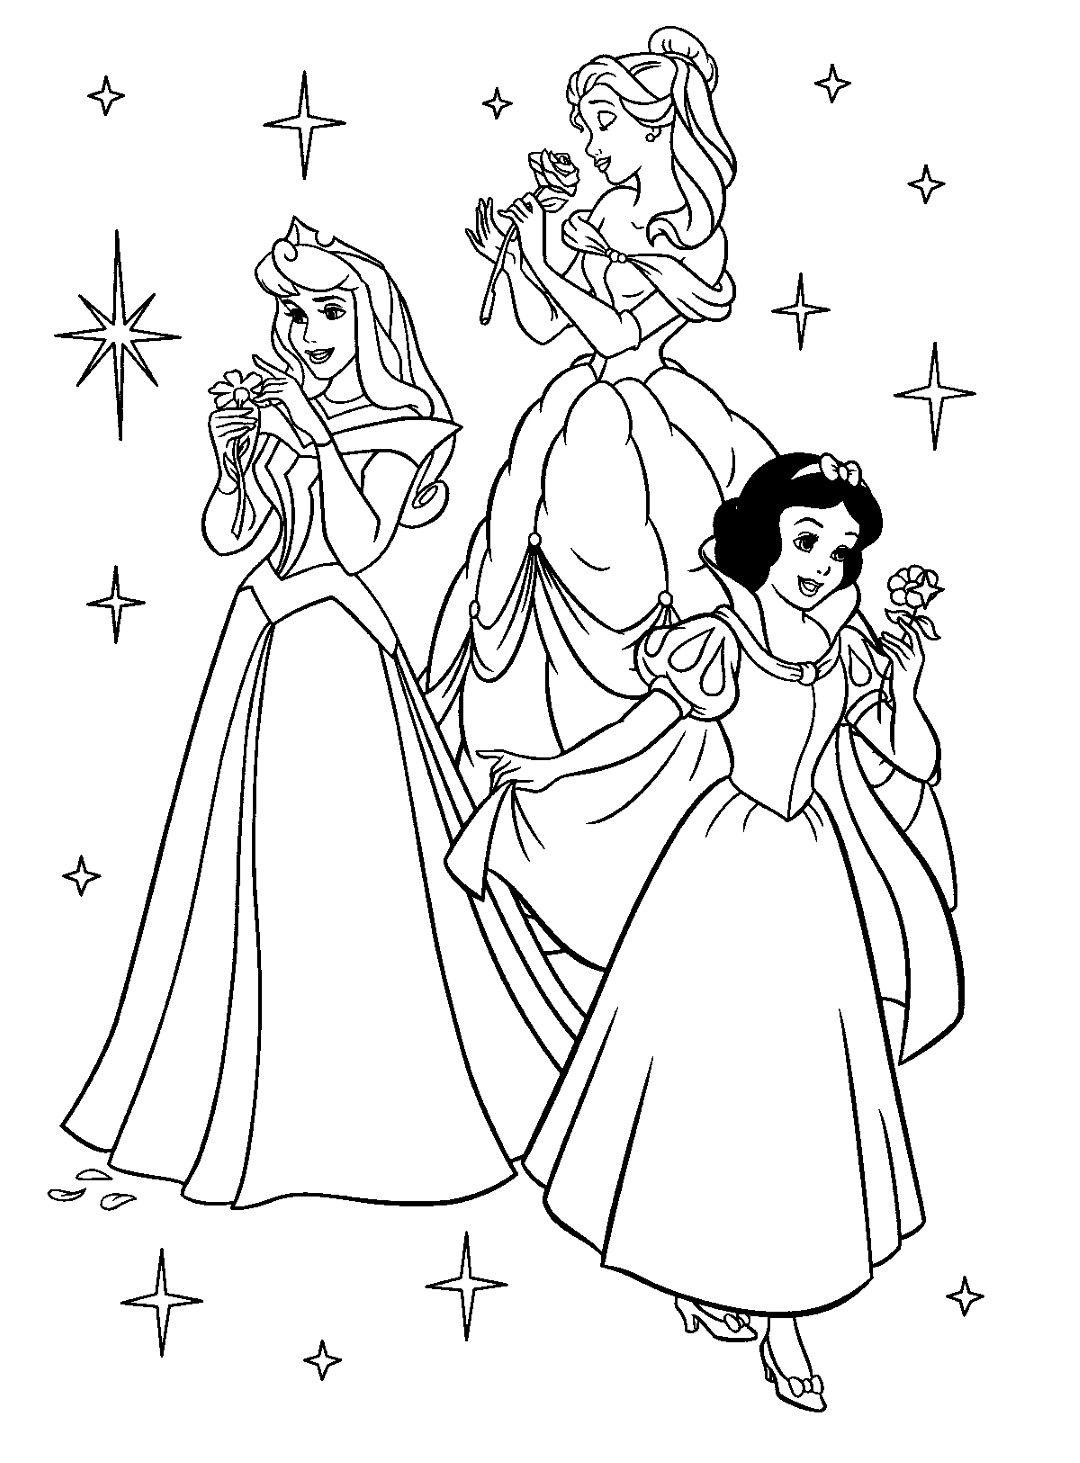 Coloring Rocks Disney Princess Coloring Pages Princess Coloring Pages Disney Princess Colors